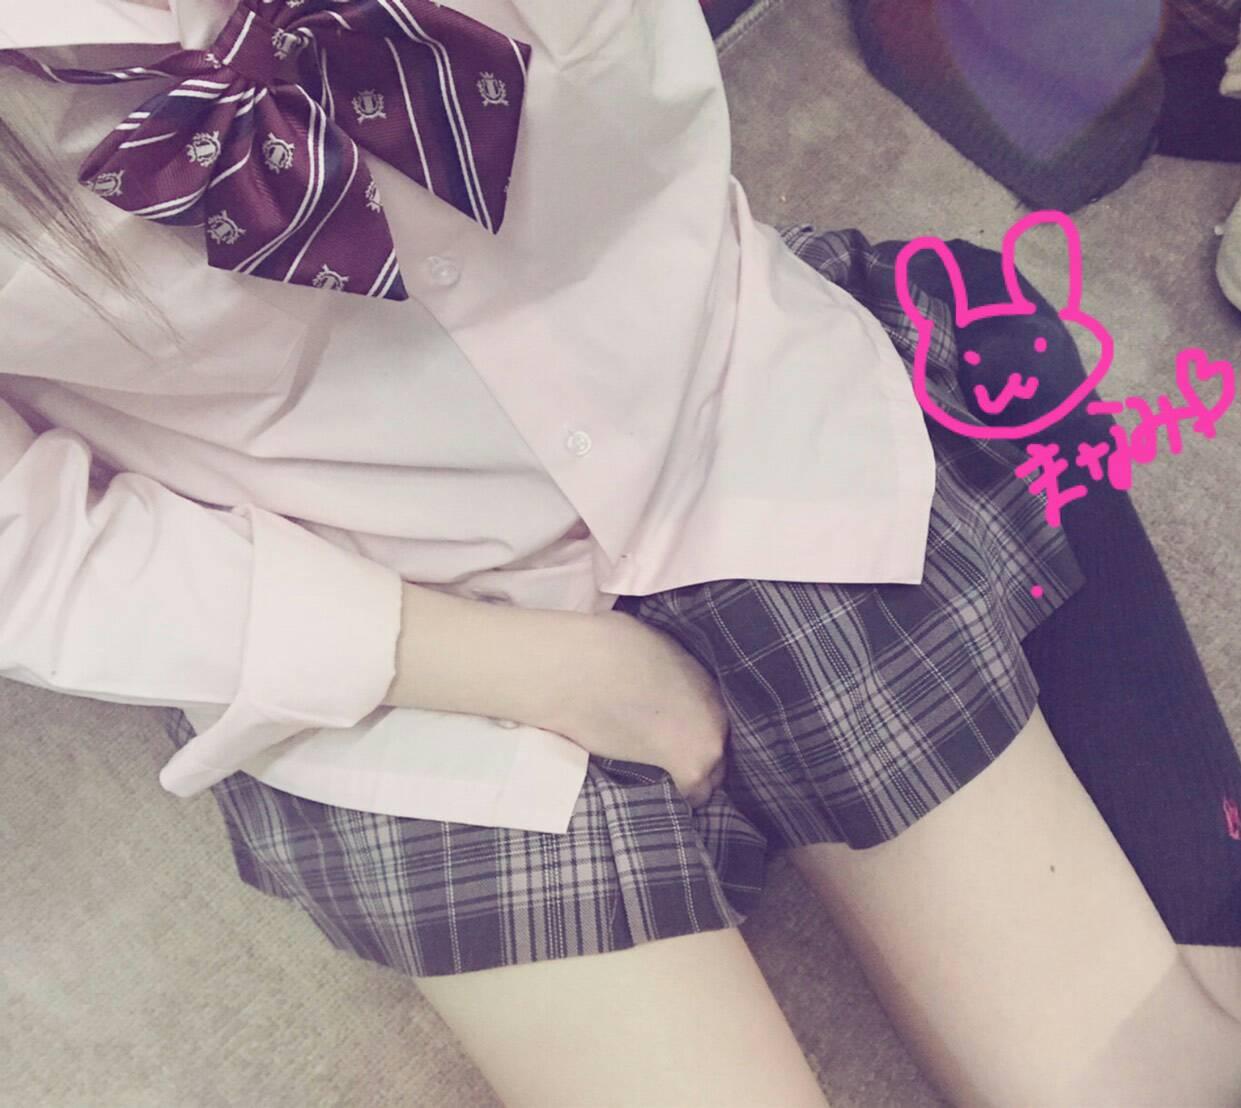 S_7048878598008.jpg